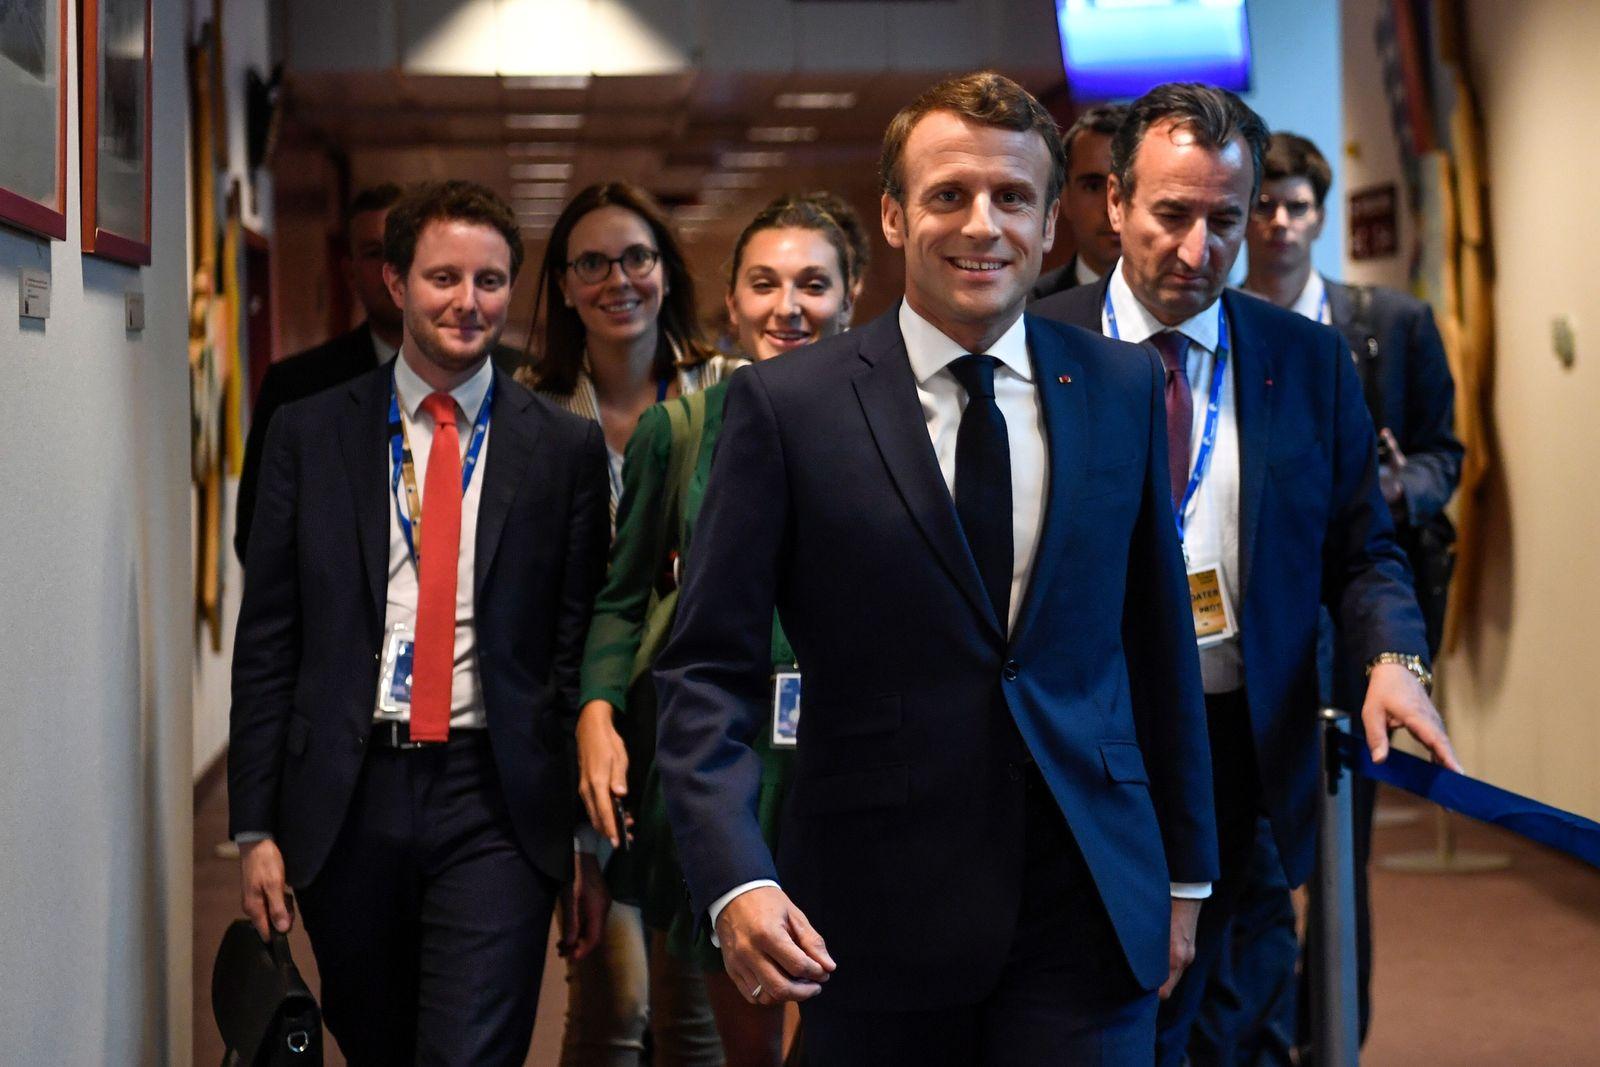 Macron EU Summit